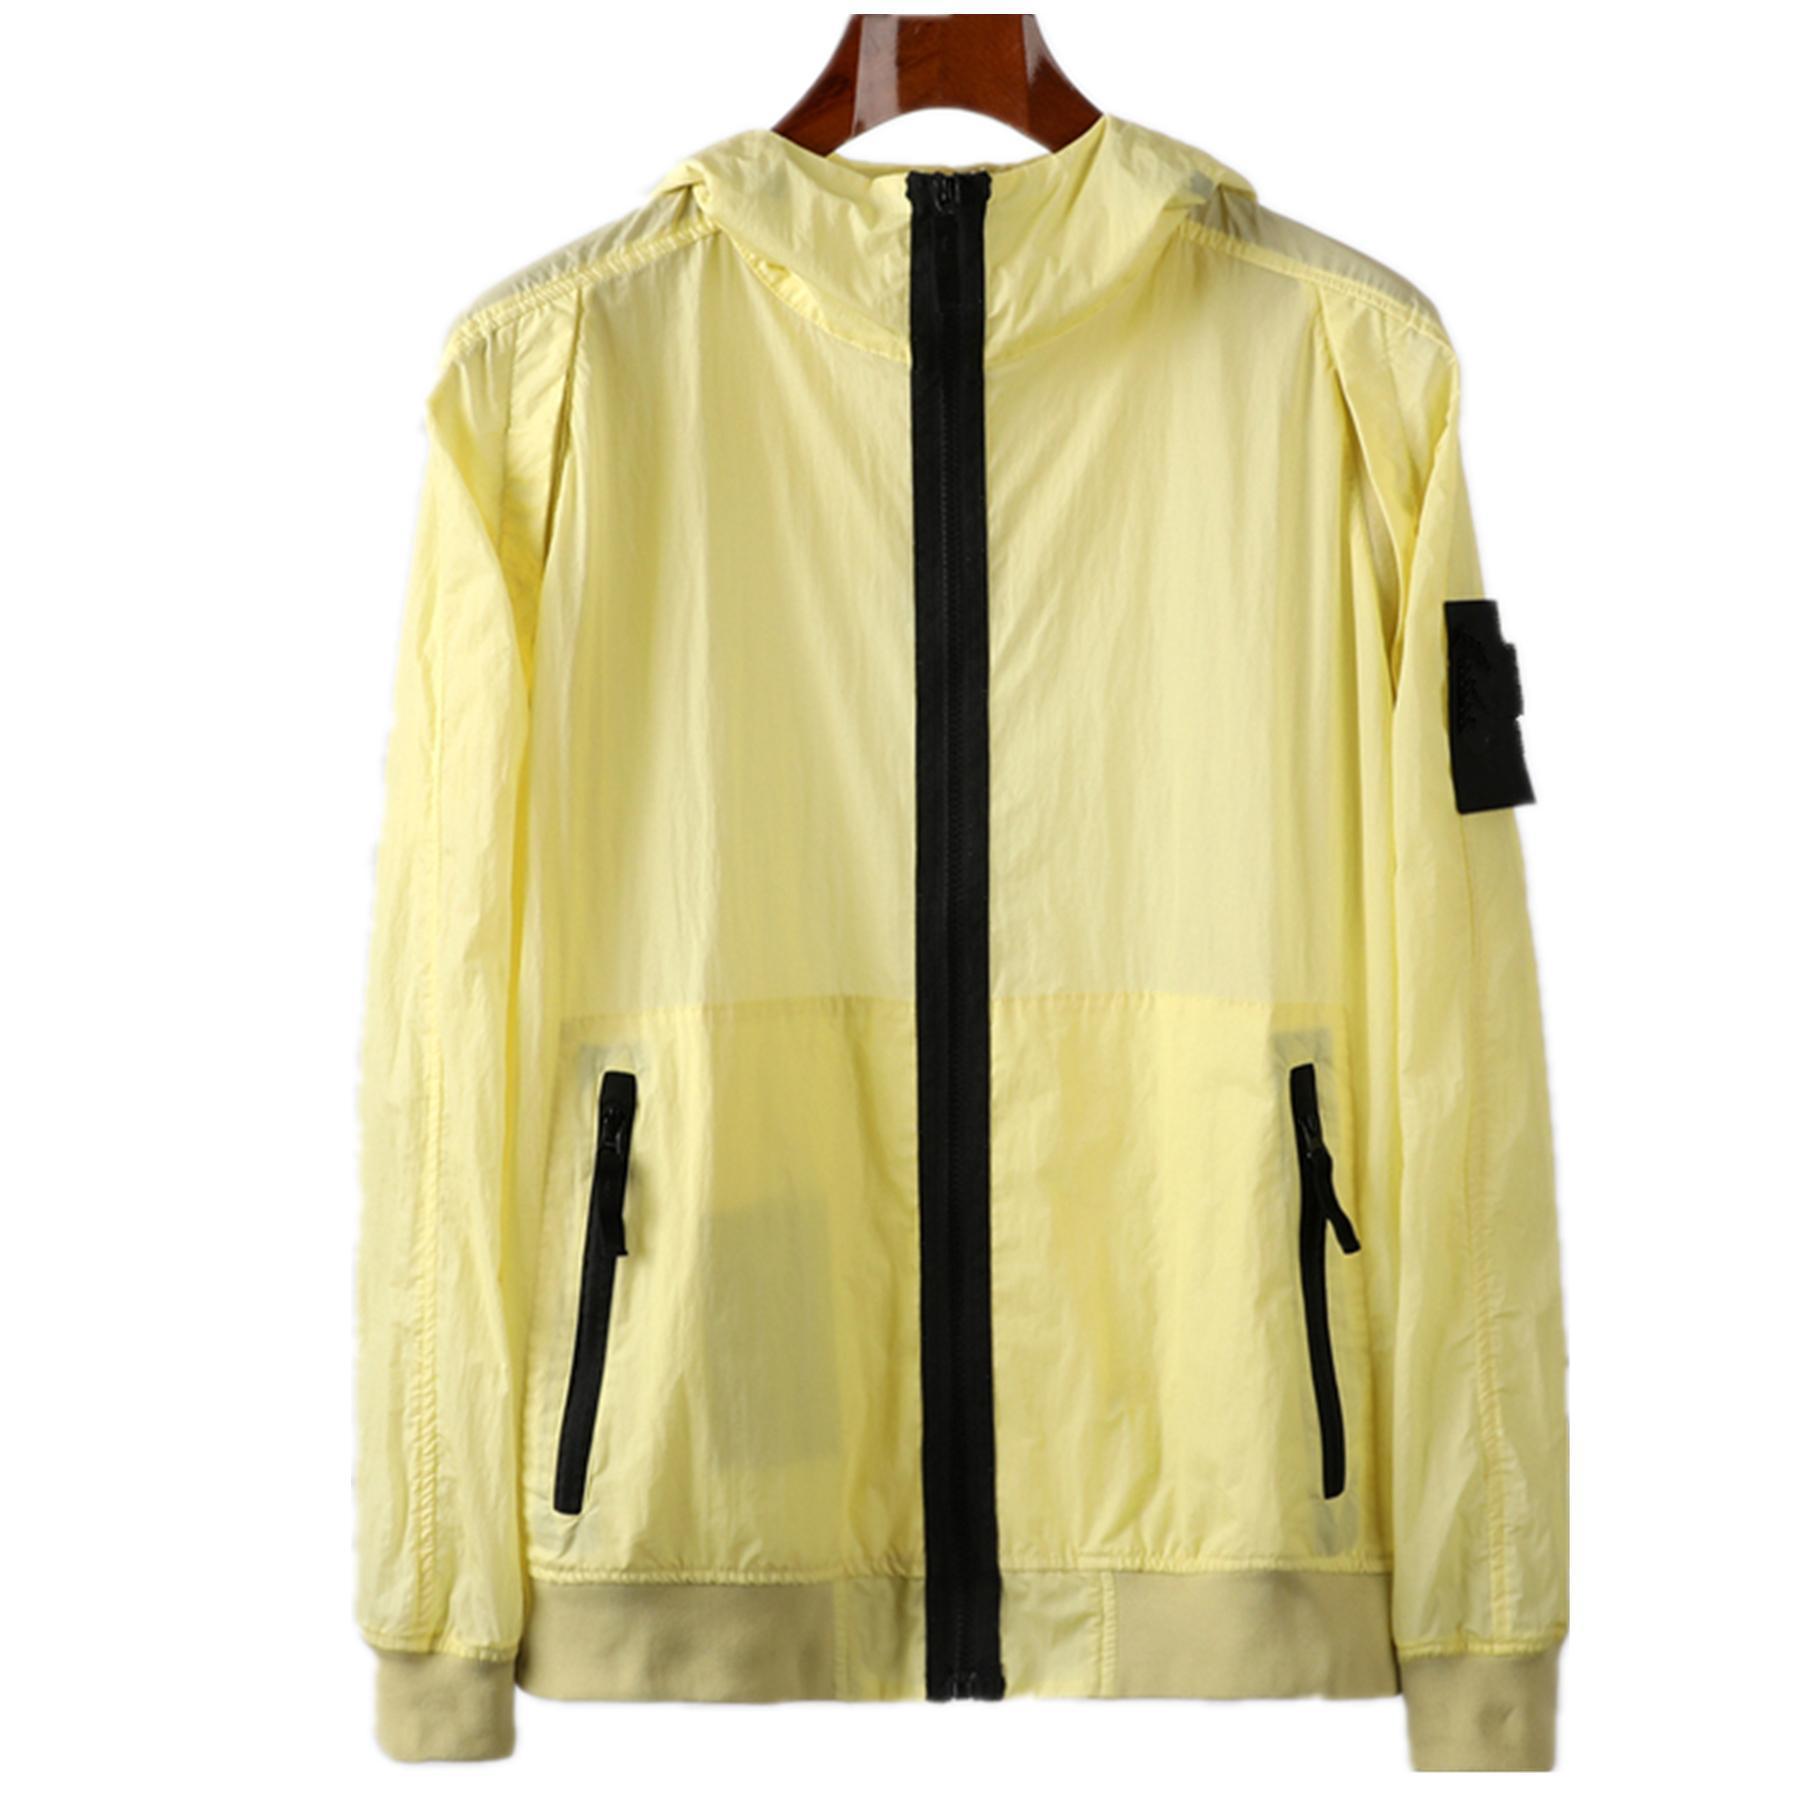 CP Topstoney Pirate Company 2020 Konng 새로운 봄과 여름 얇은 재킷 패션 브랜드 코트 야외 햇살 증거 방지 장치